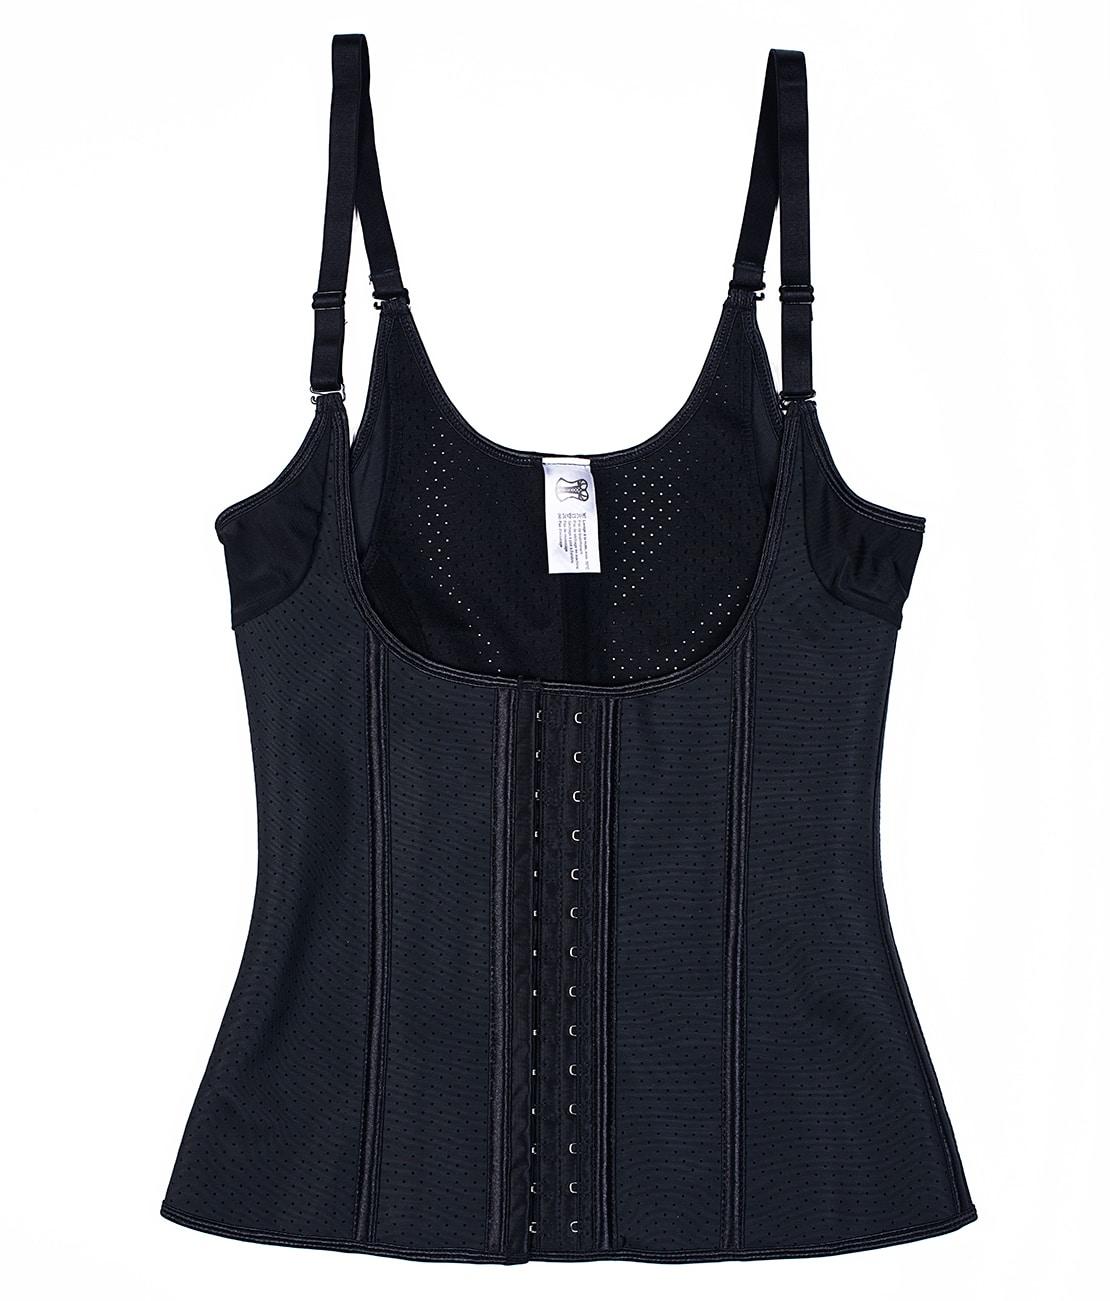 Corset Latex Grand Confort Noir Packshot Front